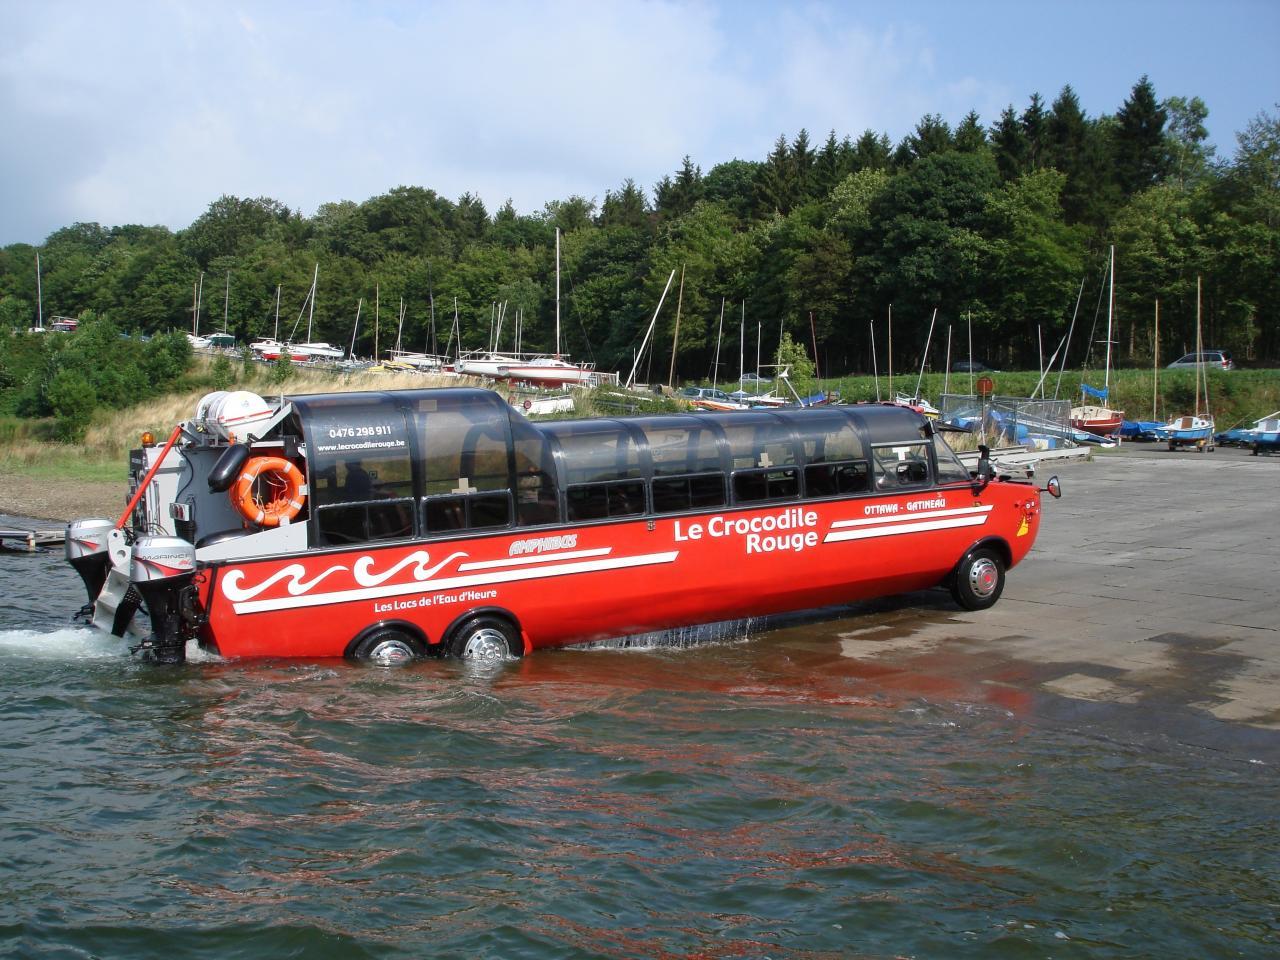 Rallye club balade des lacs de l eau d heure complet - Barrage de l odeur ...